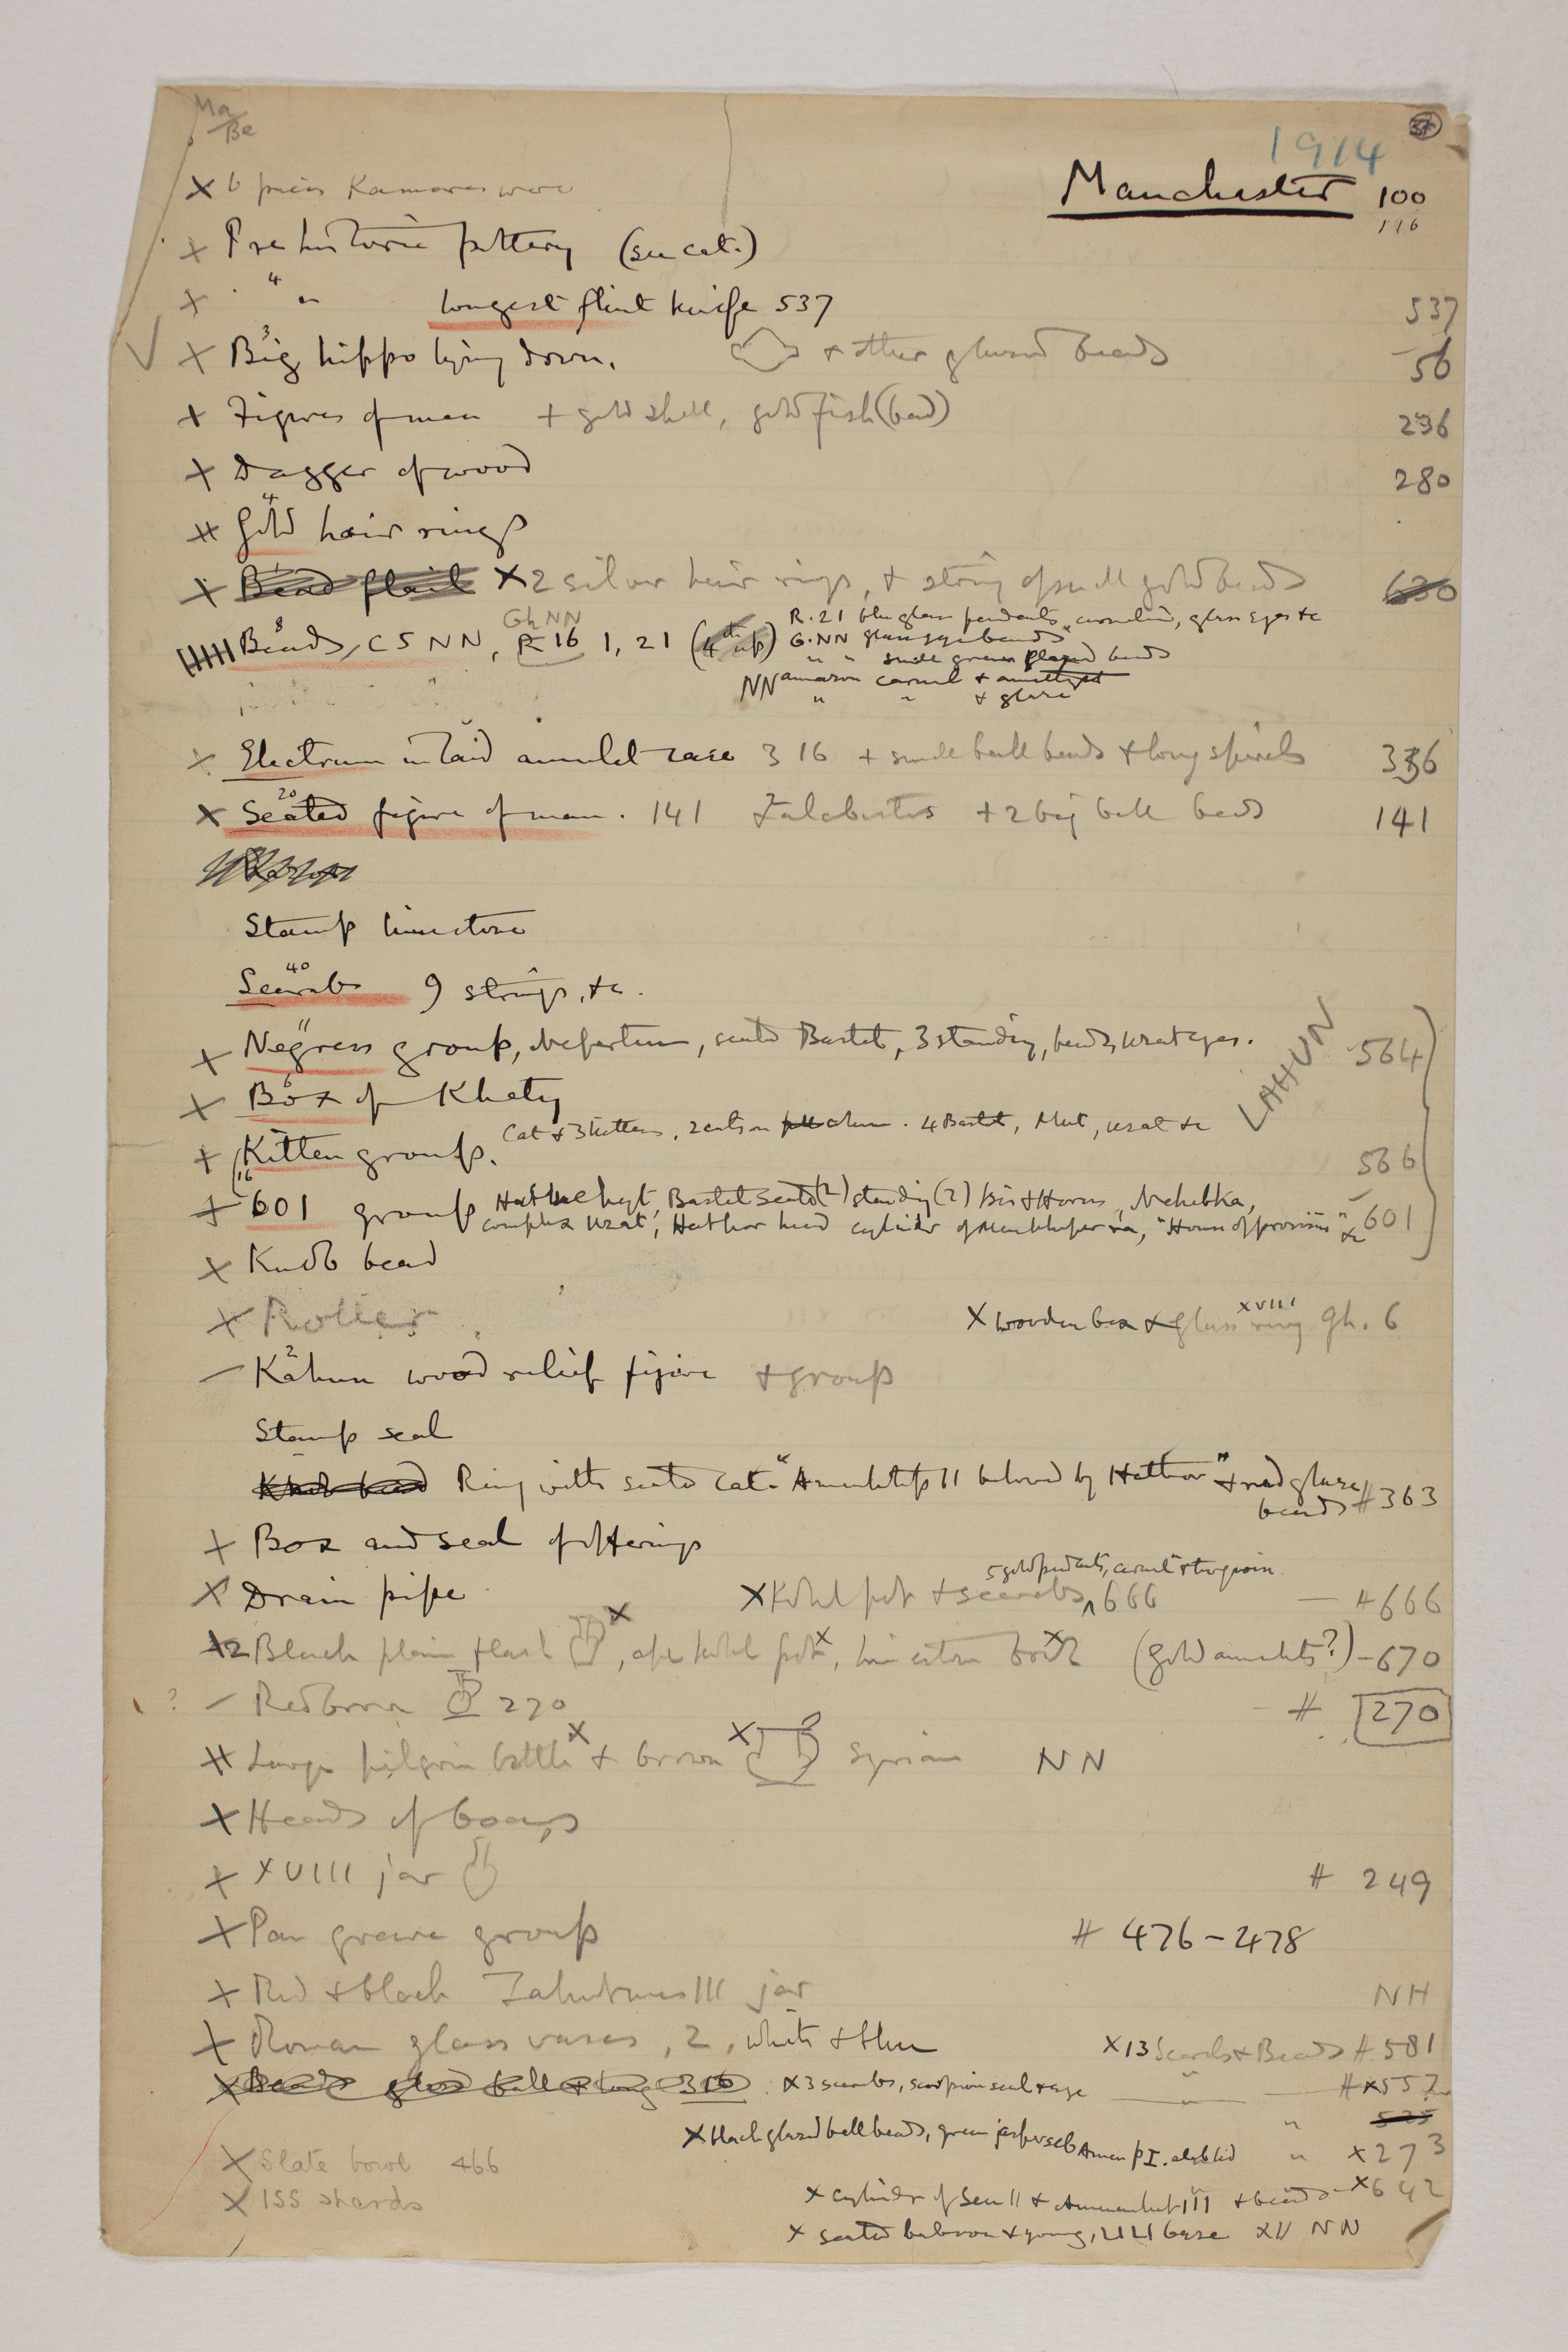 1913-14 Lahun, Haraga Individual institution list  PMA/WFP1/D/22/37.1